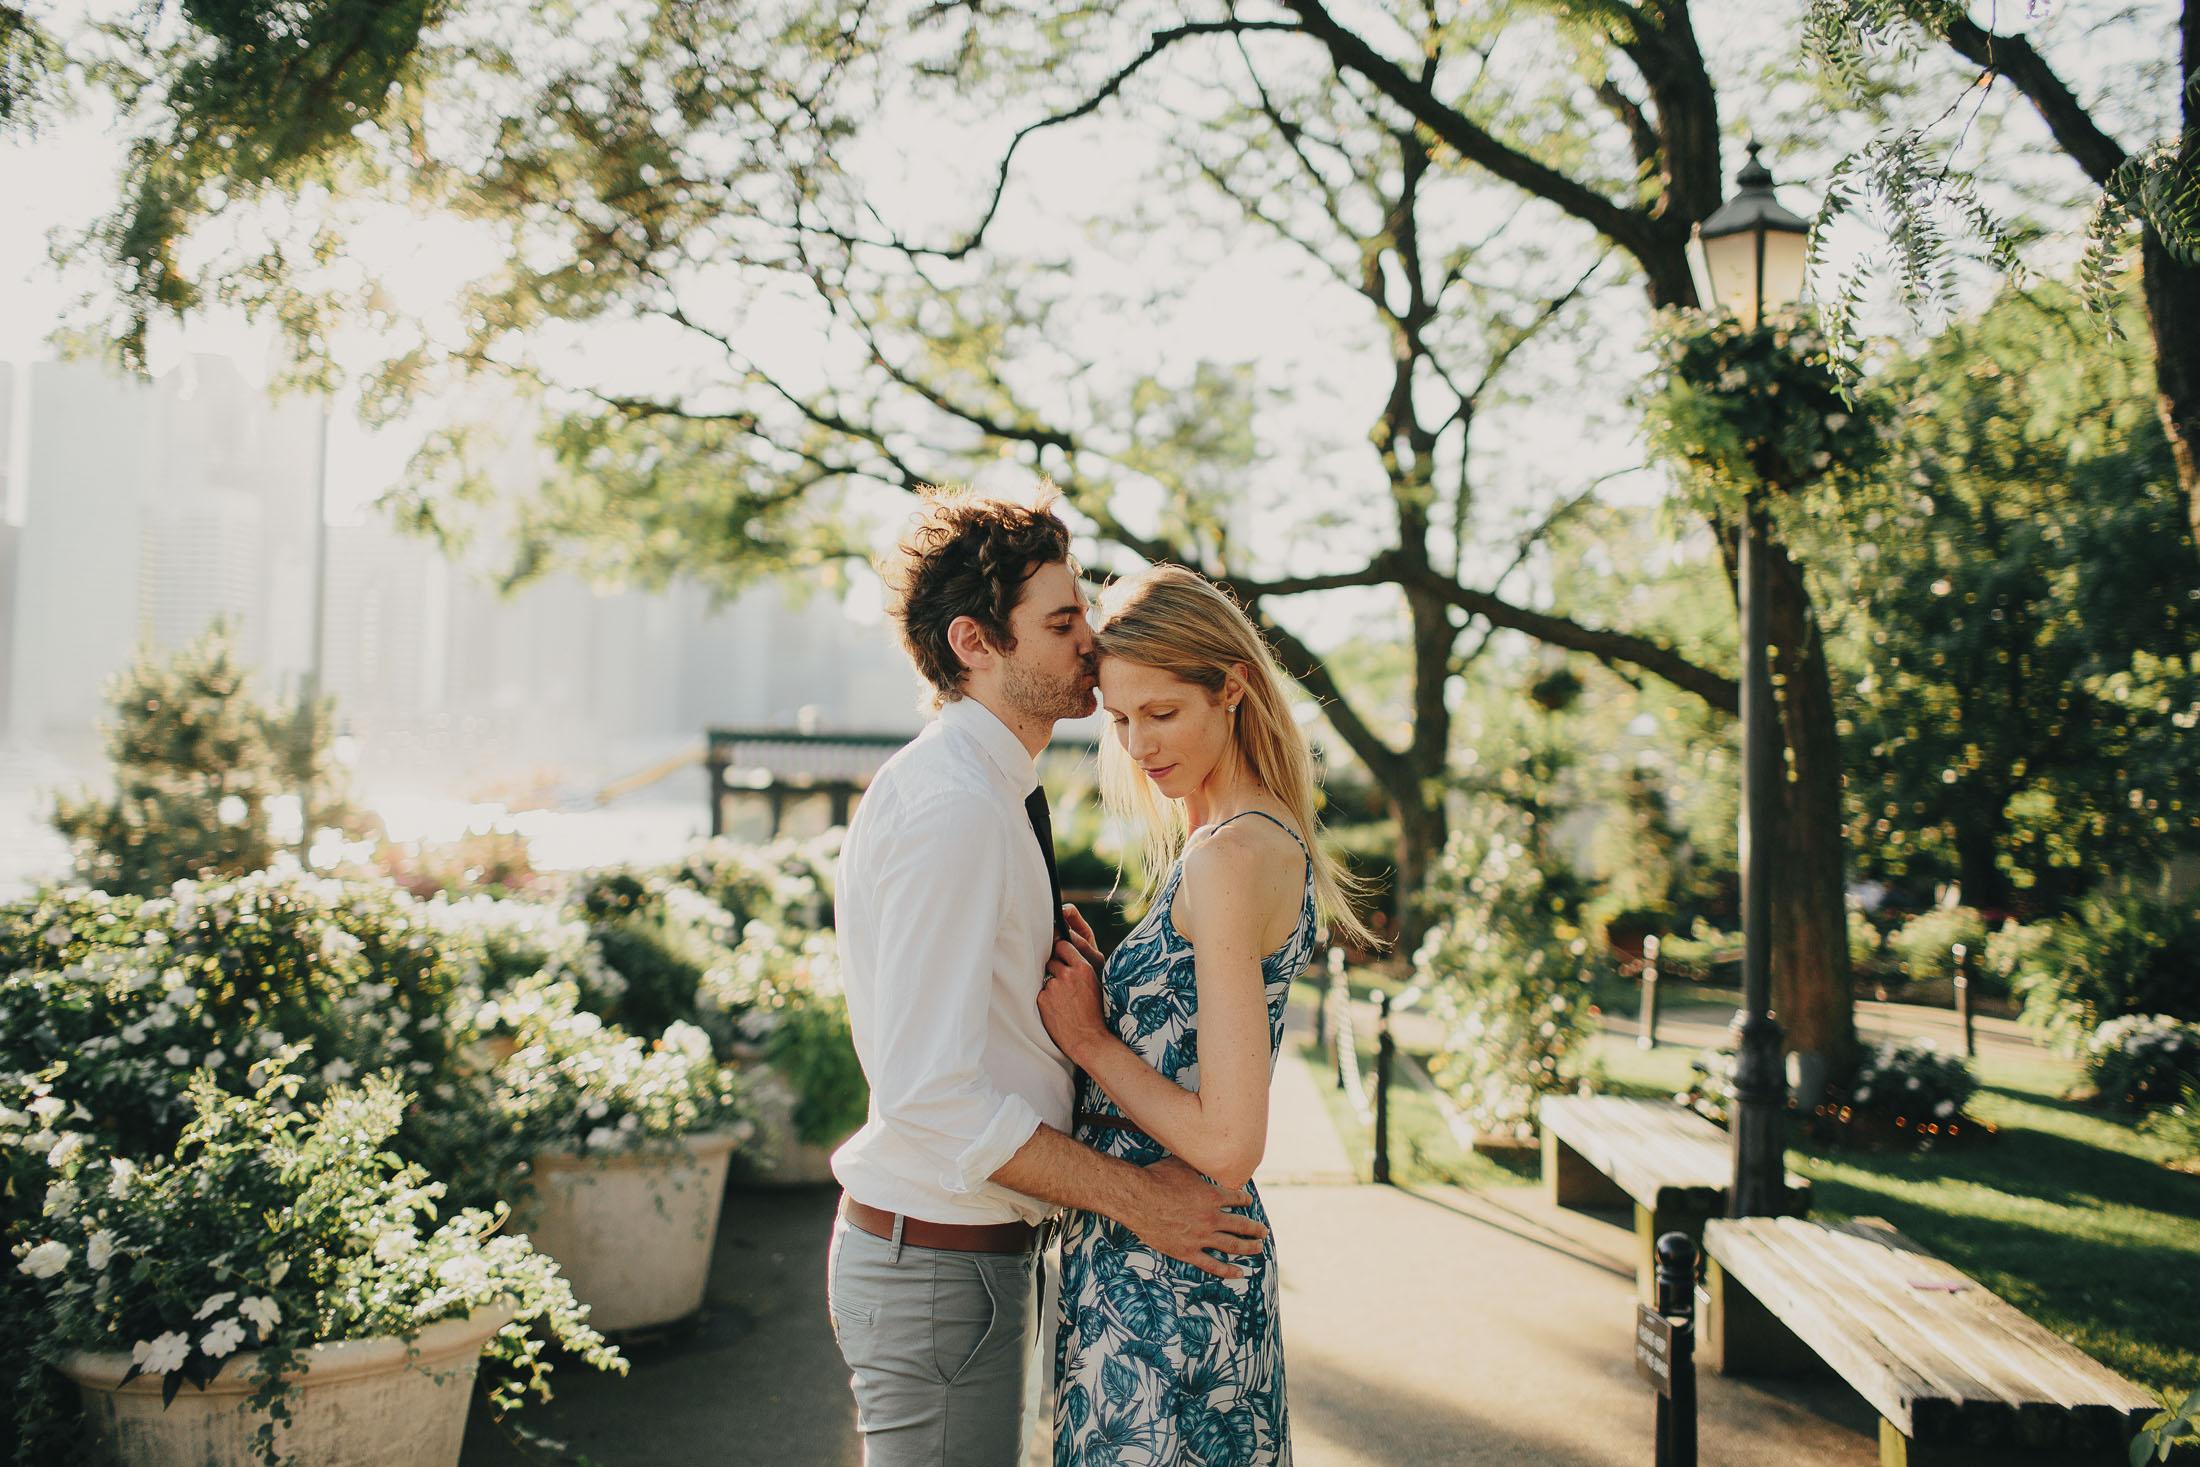 42 finch and oak engagement wedding photographer gold coast new york brooklyn.jpg